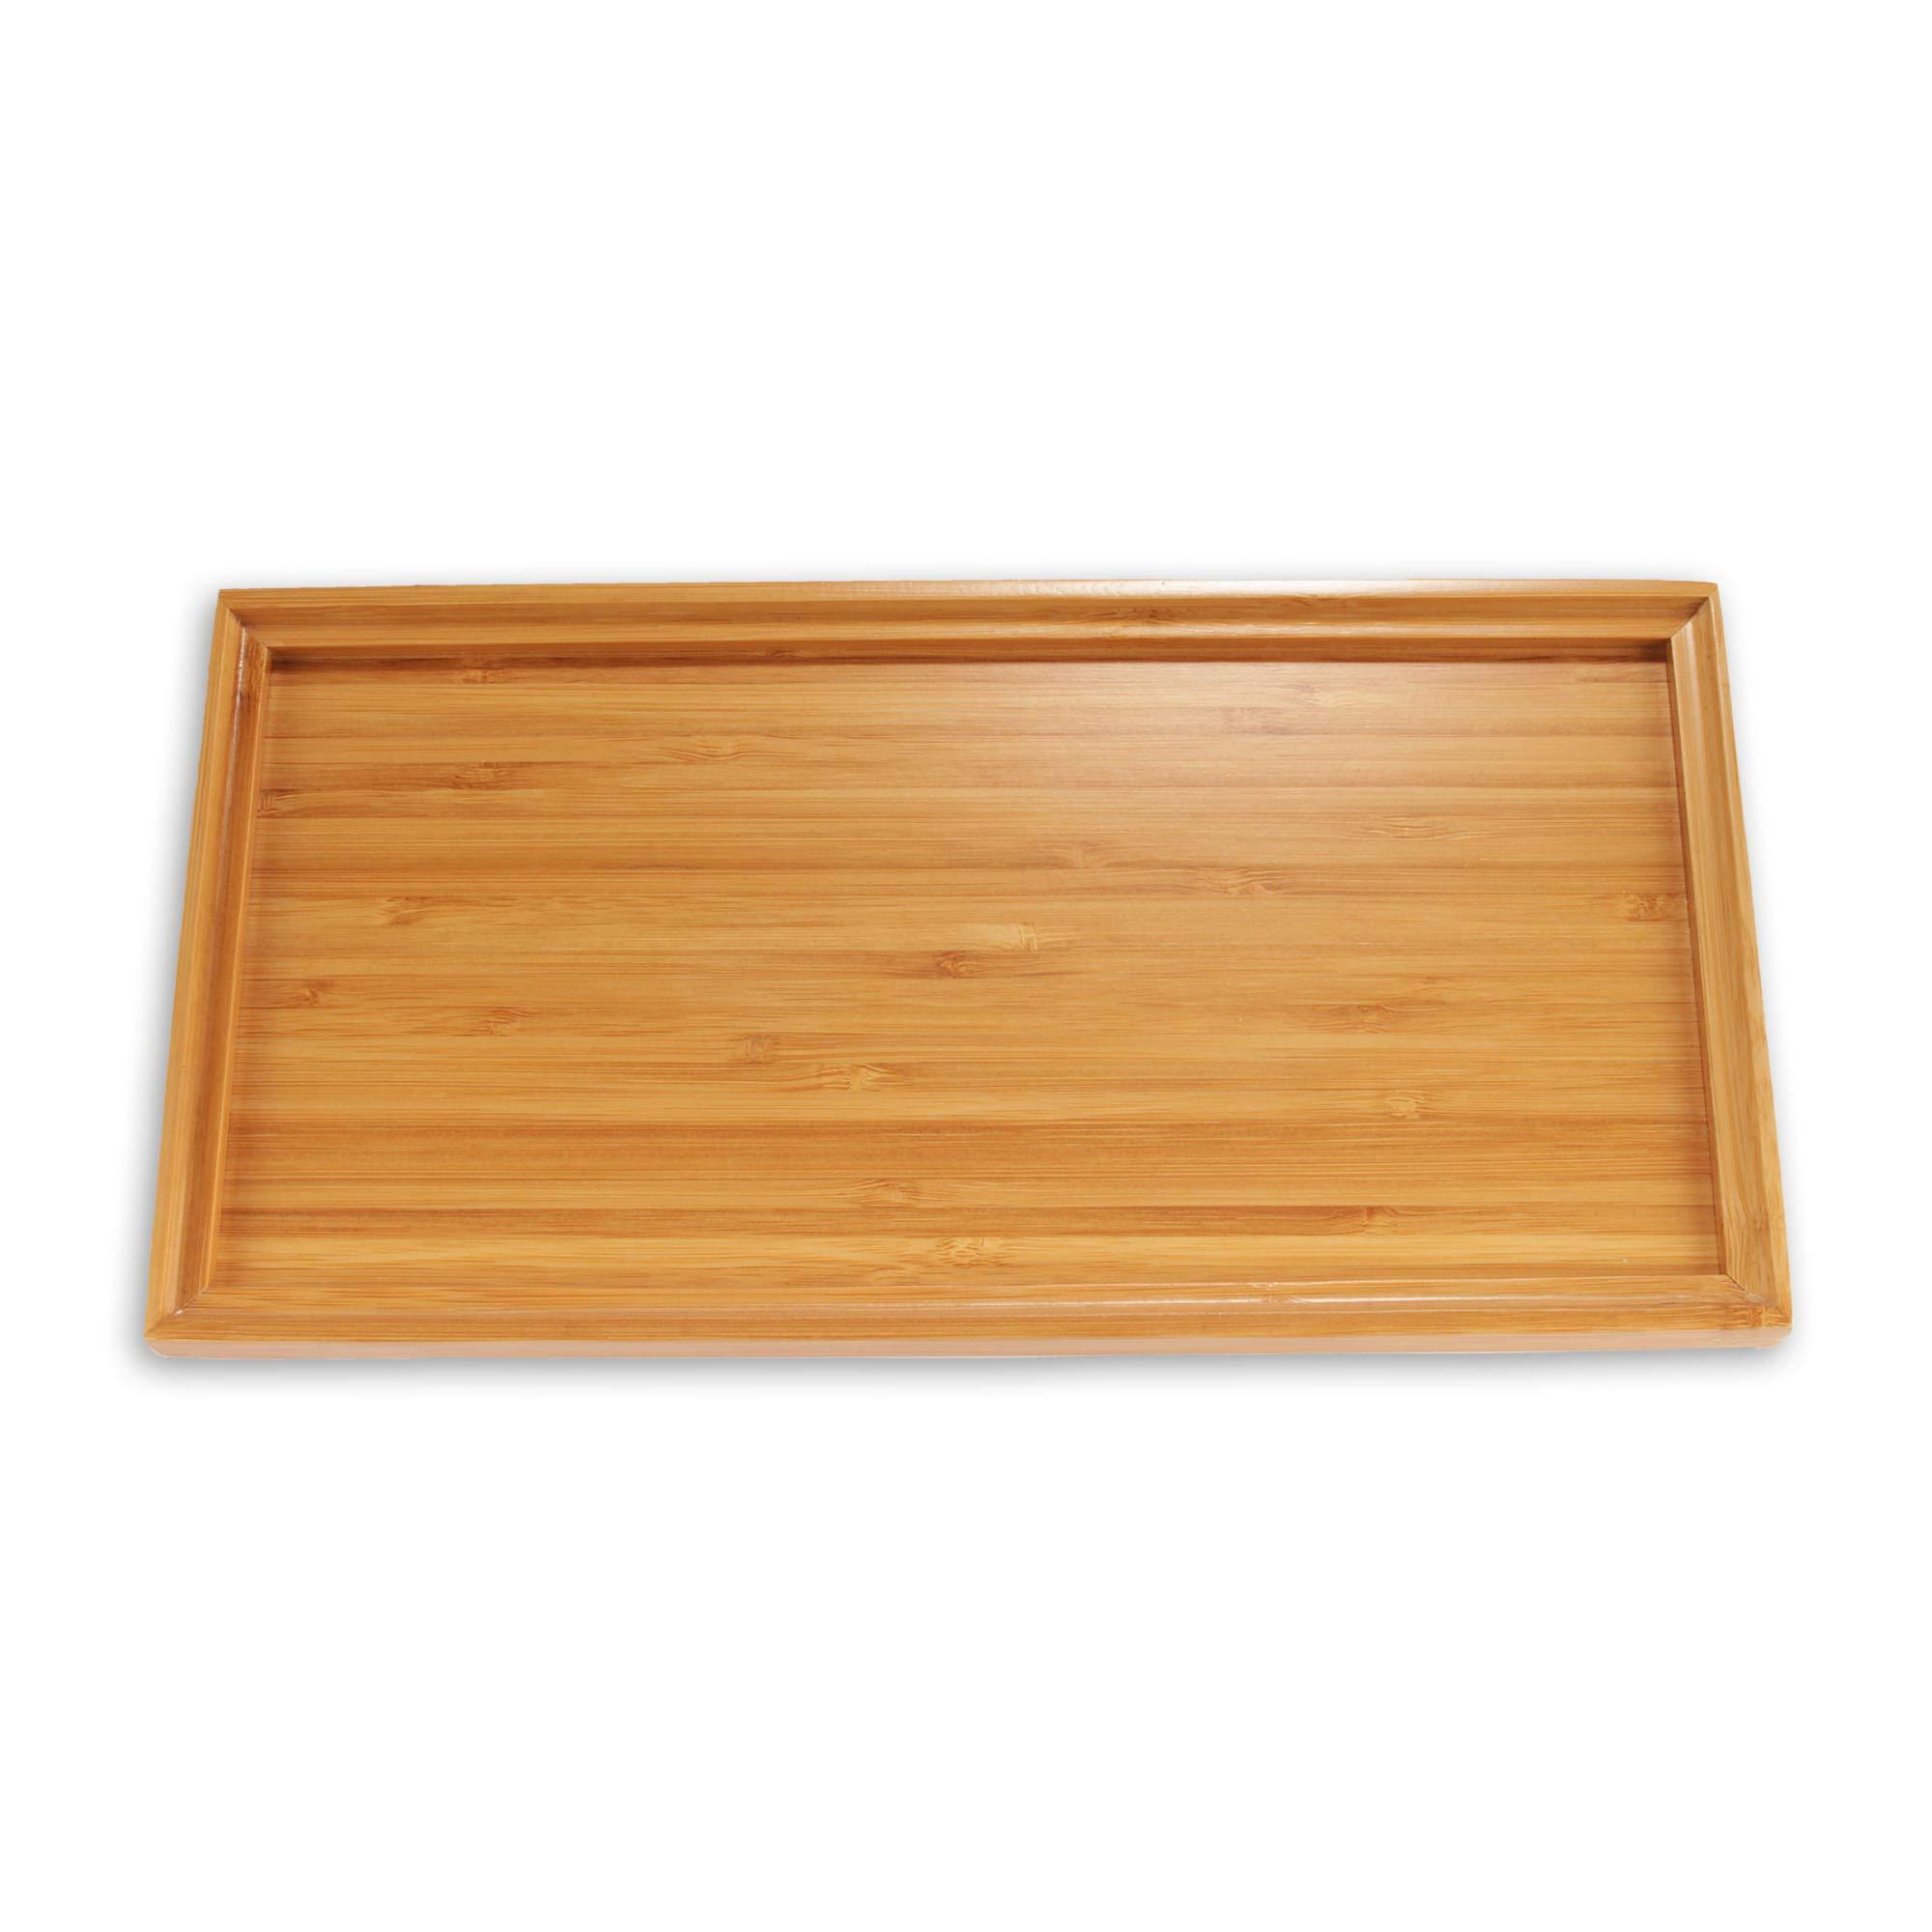 "Organic Bamboo Tea Serving Tray - 11""x5.5""x0.6"" - 10 Pieces"